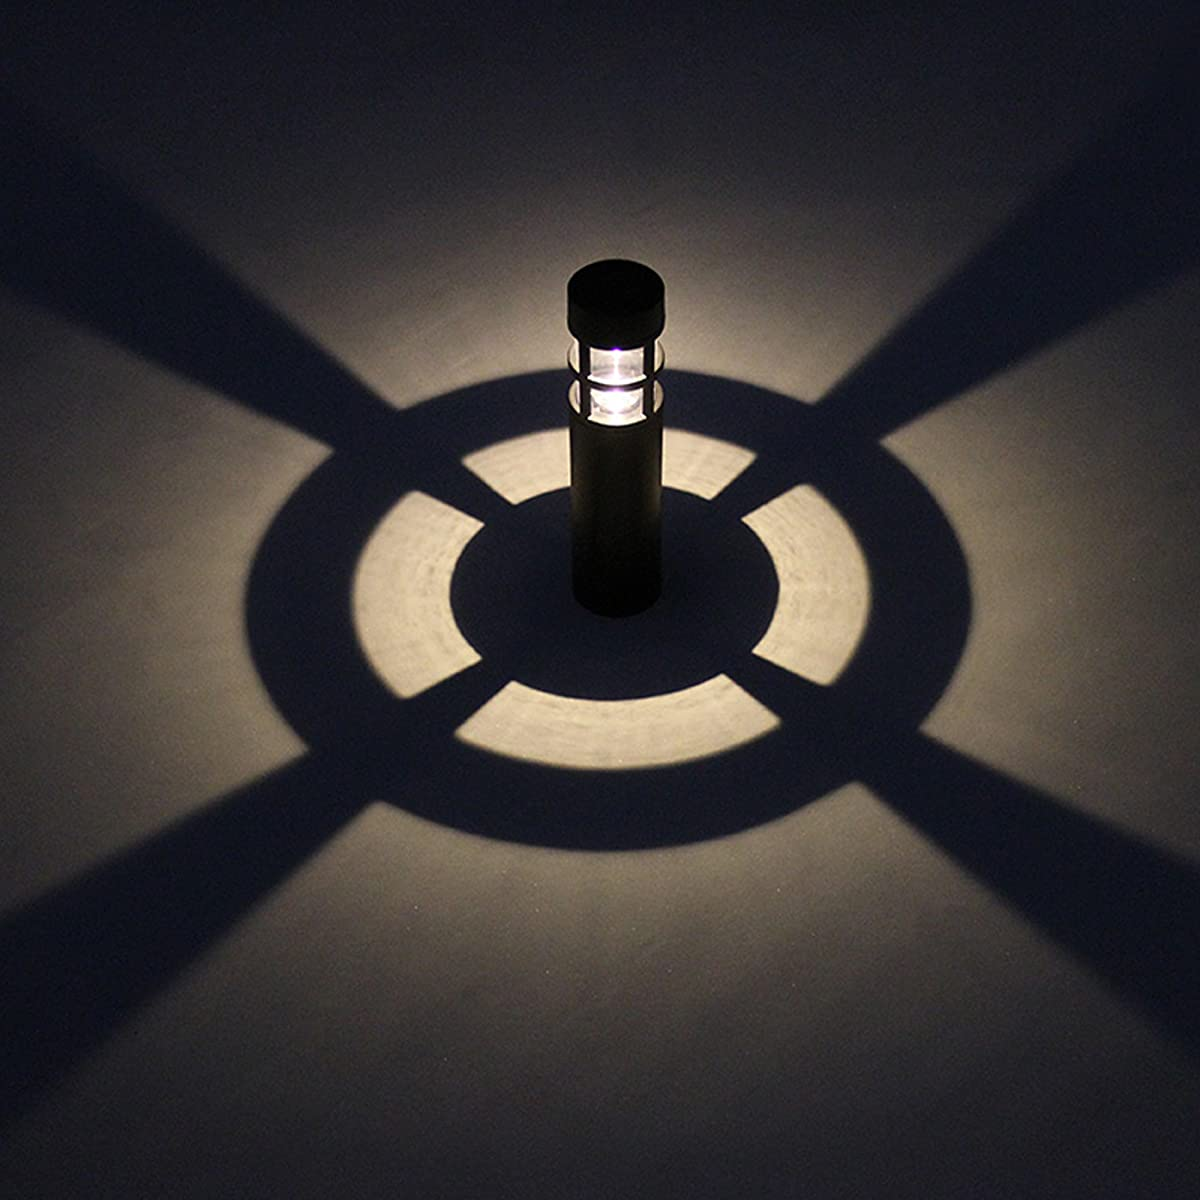 Voona Solar Bollard Lights Outdoor 6-Pack Garden LED Pathway Lights, (Black)